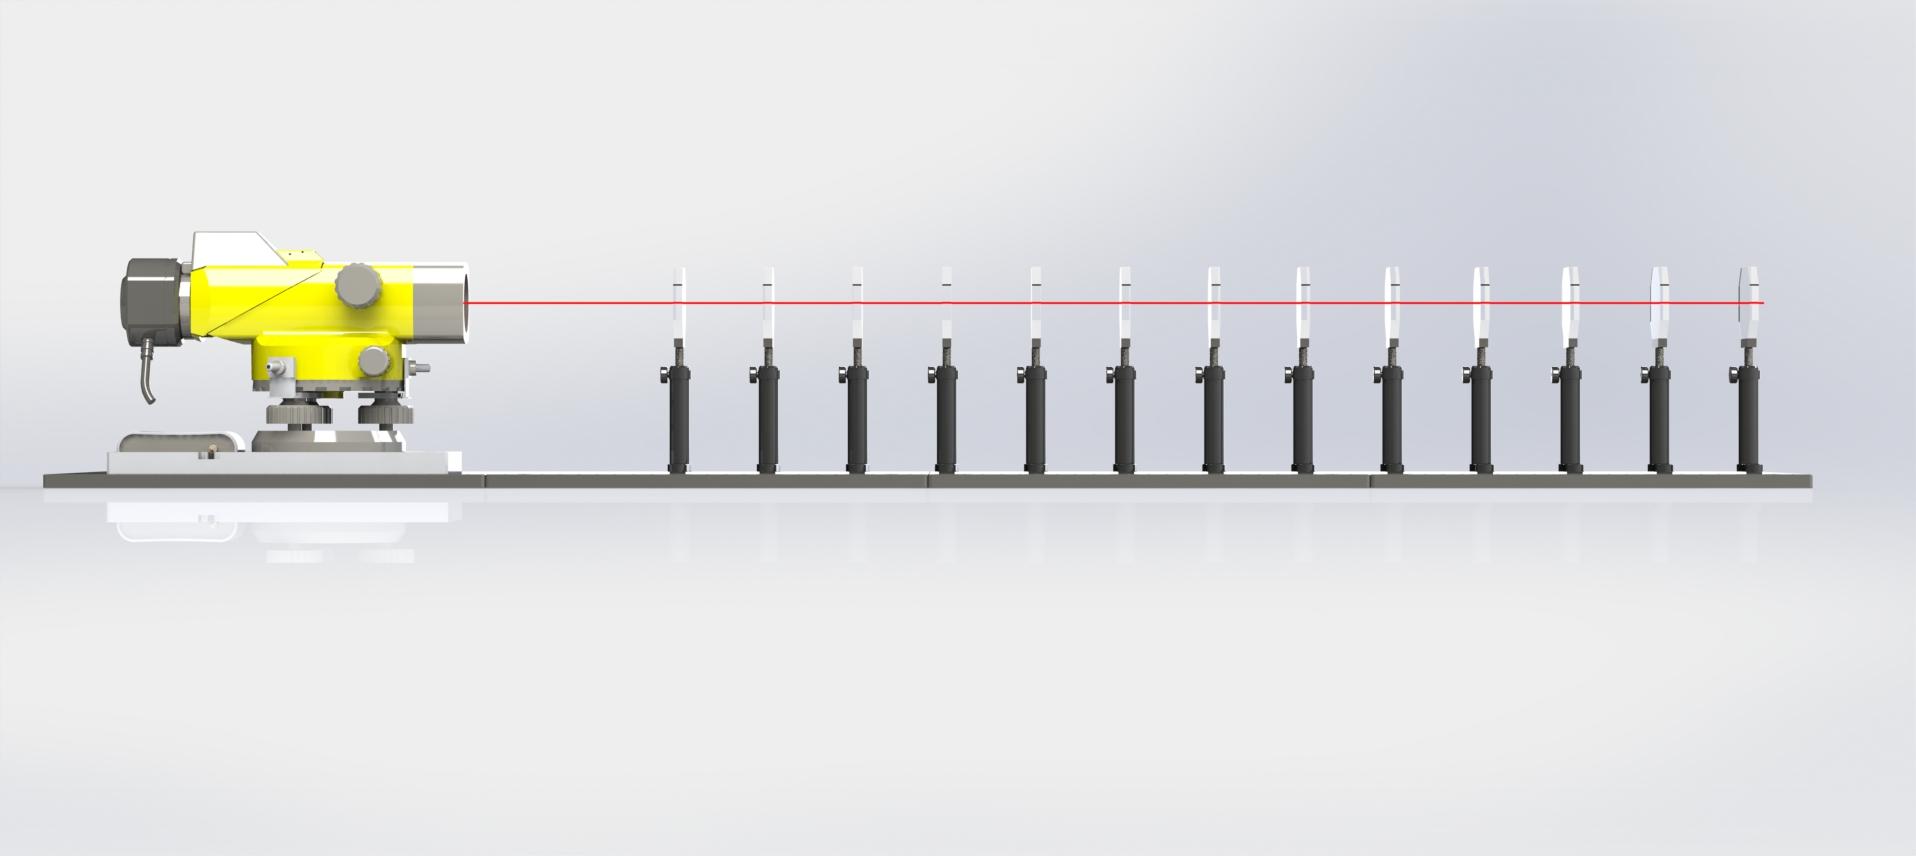 Machinery Alignment Diagram